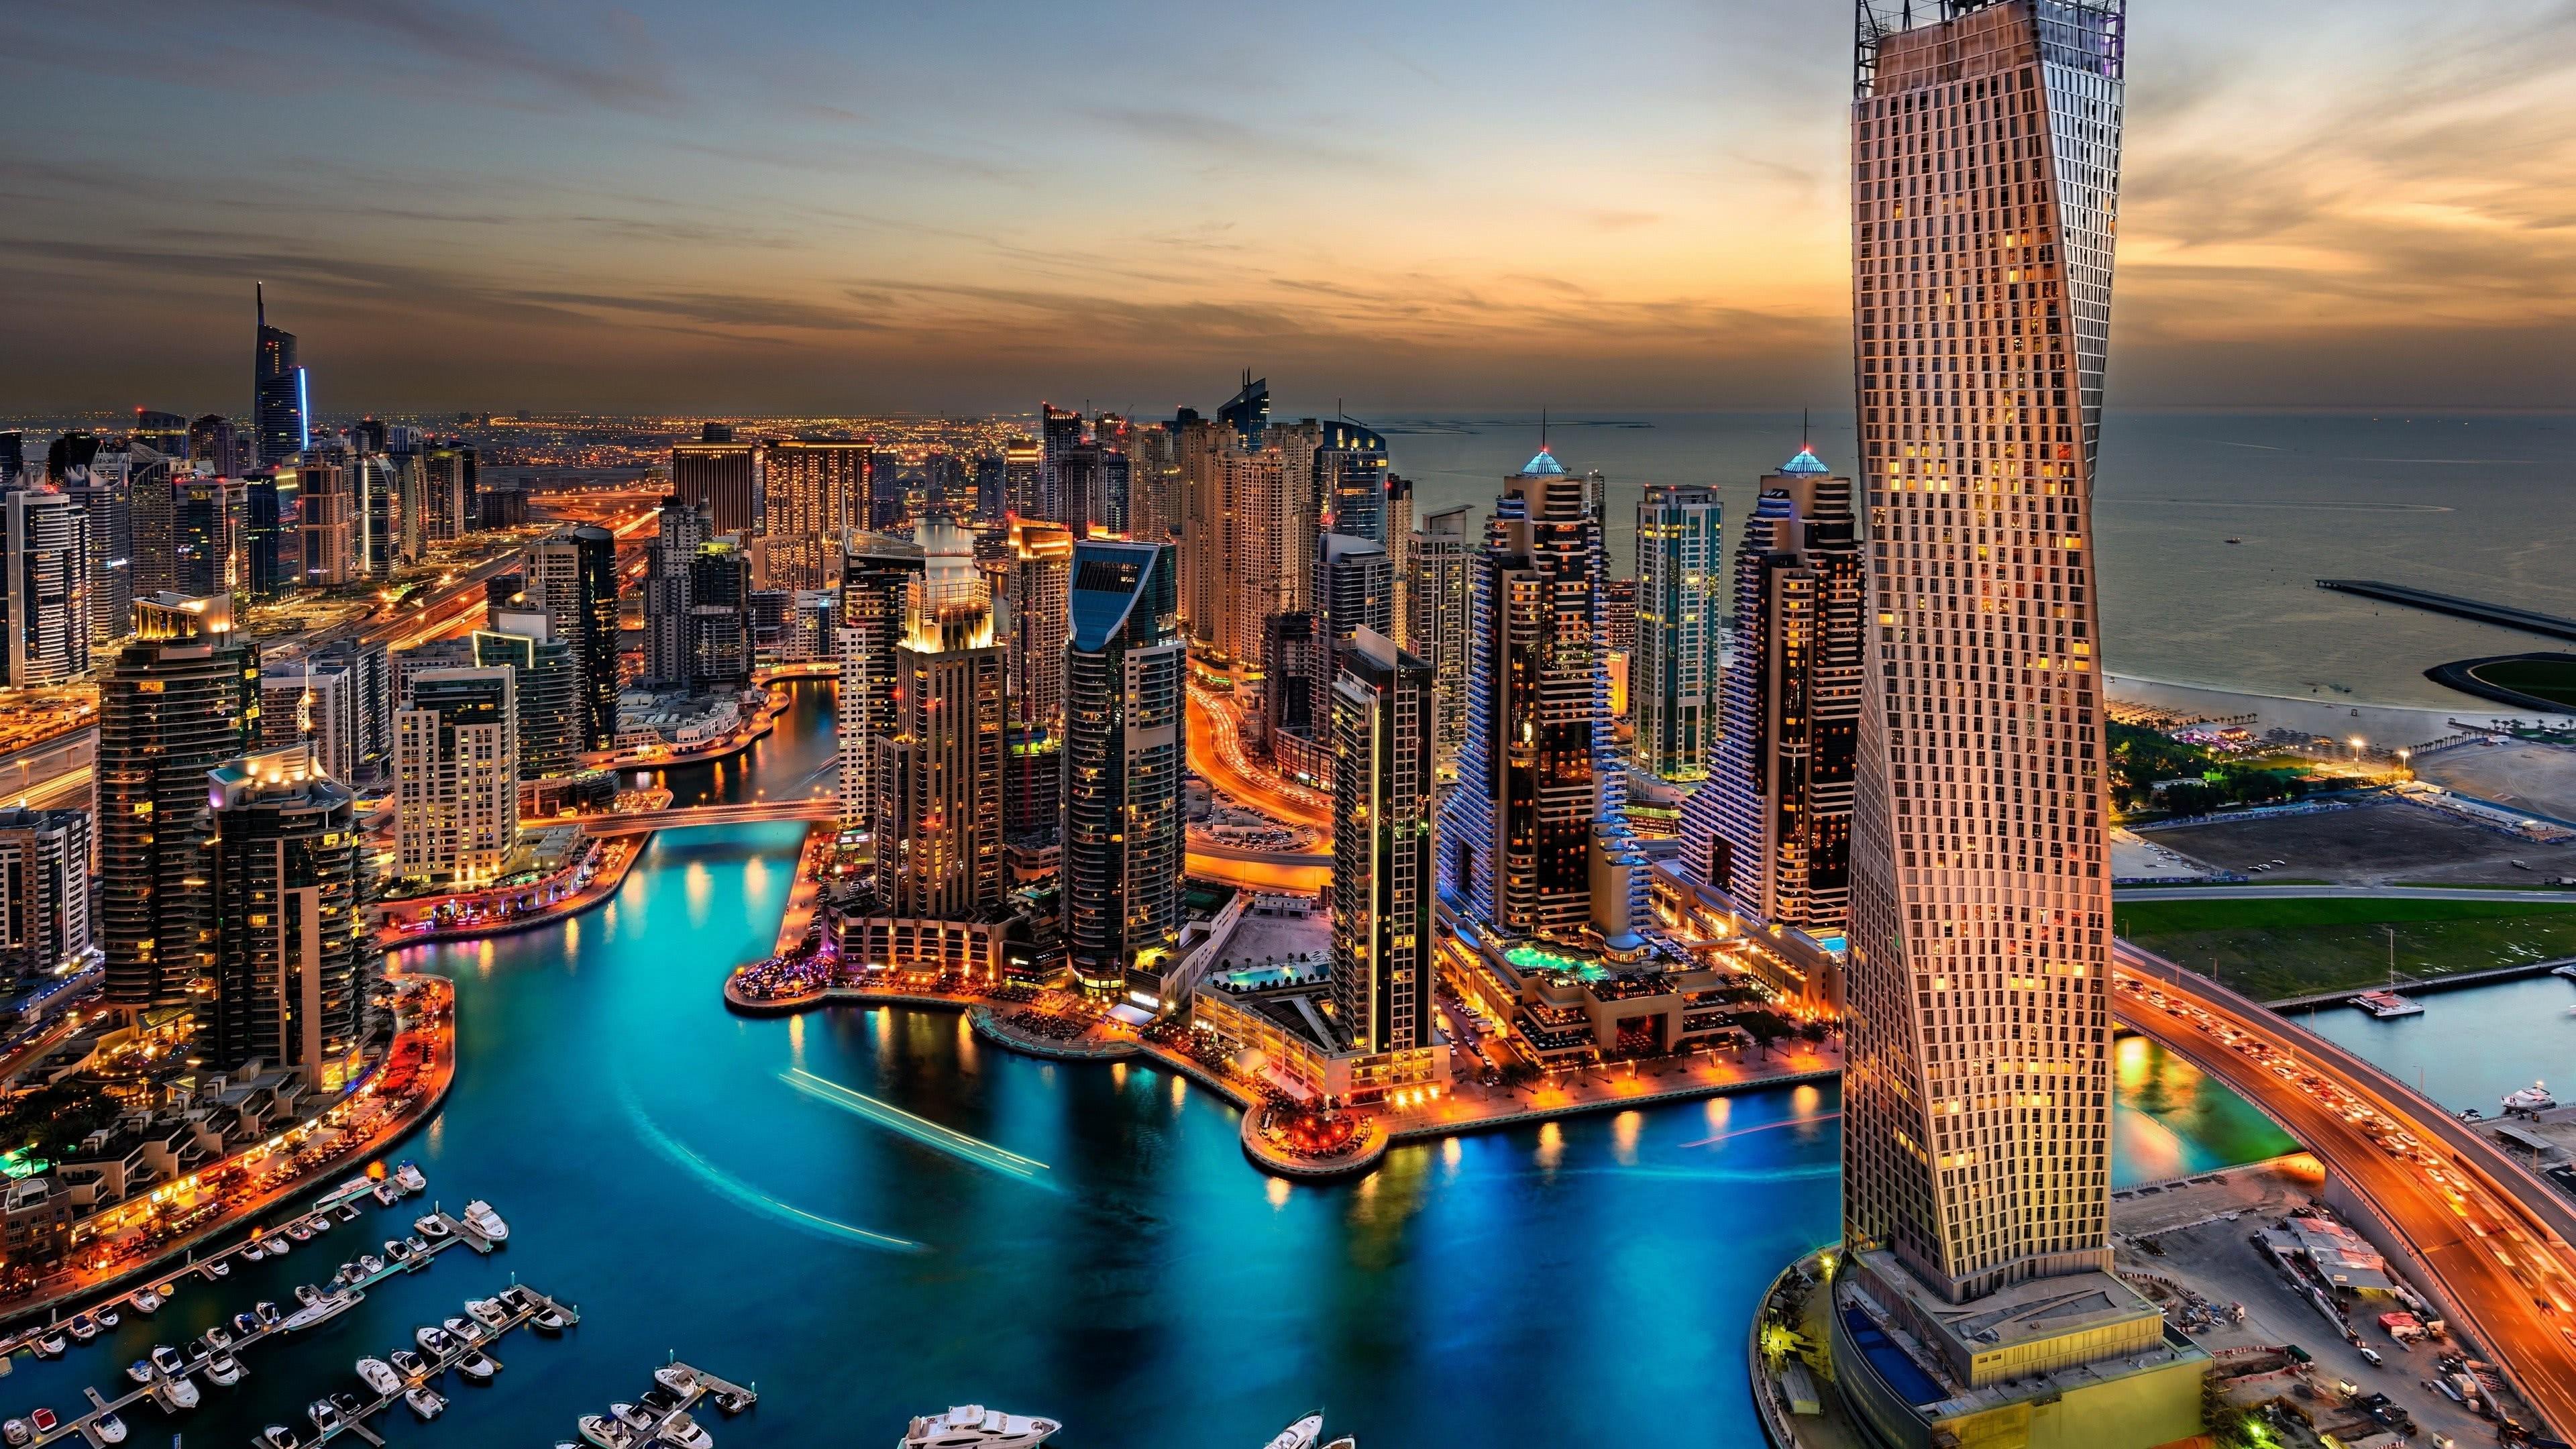 Dubai 4k Wallpaper 59 Images